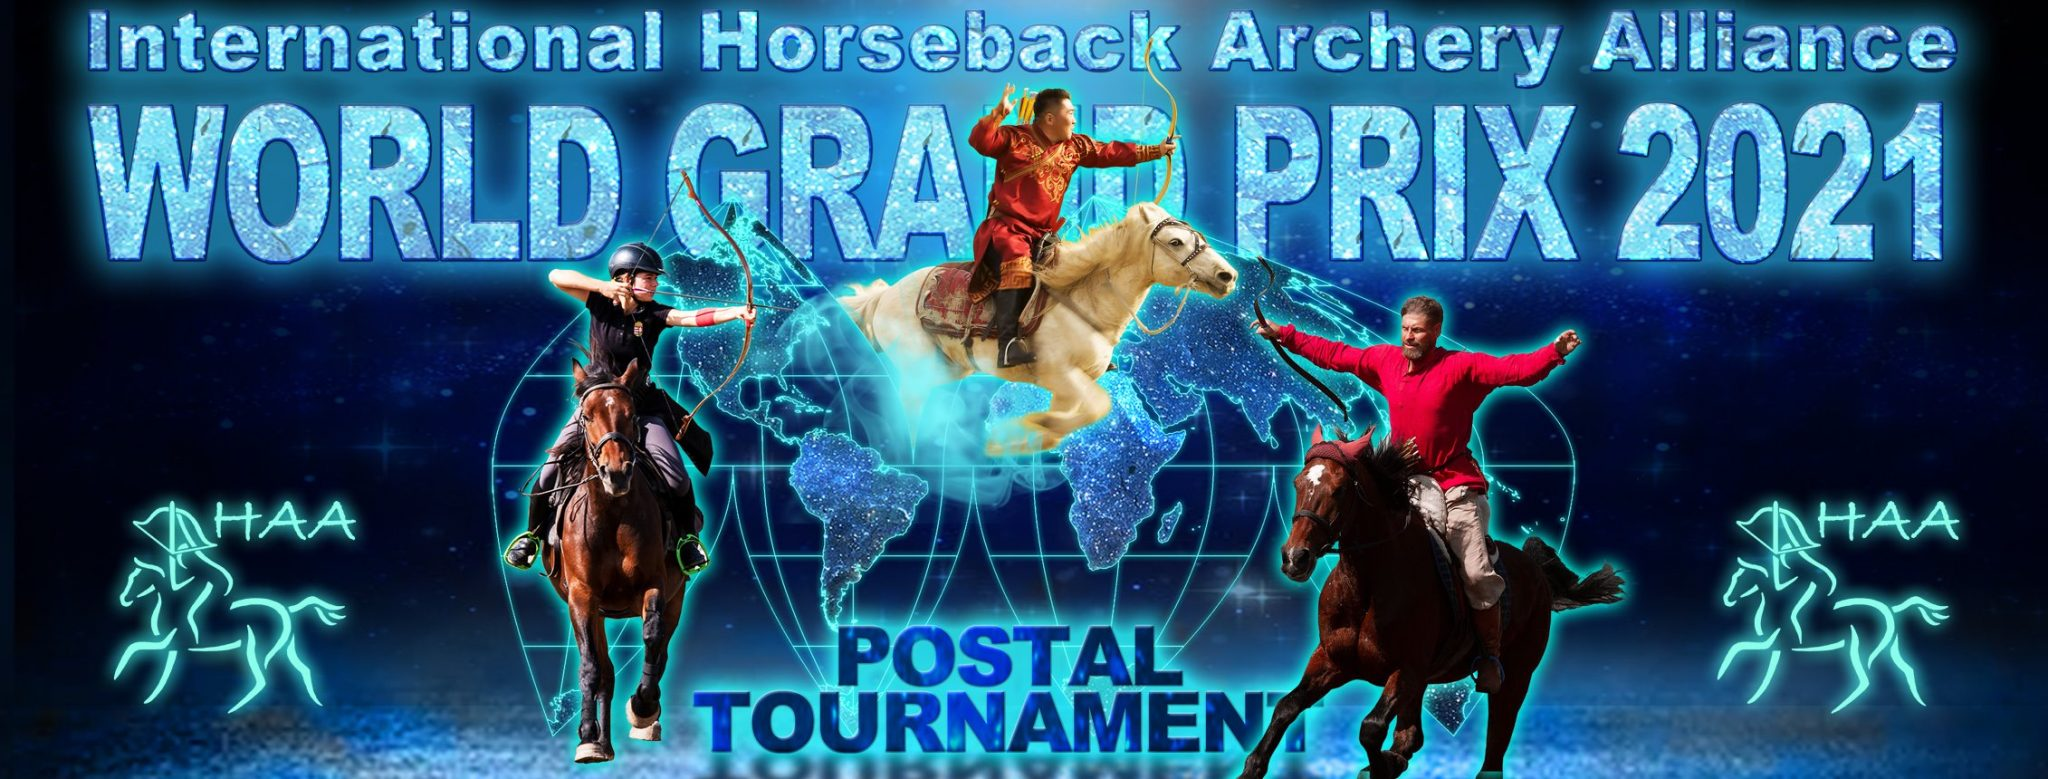 World Grand Prix - Canadian Federation of Mounted Archery